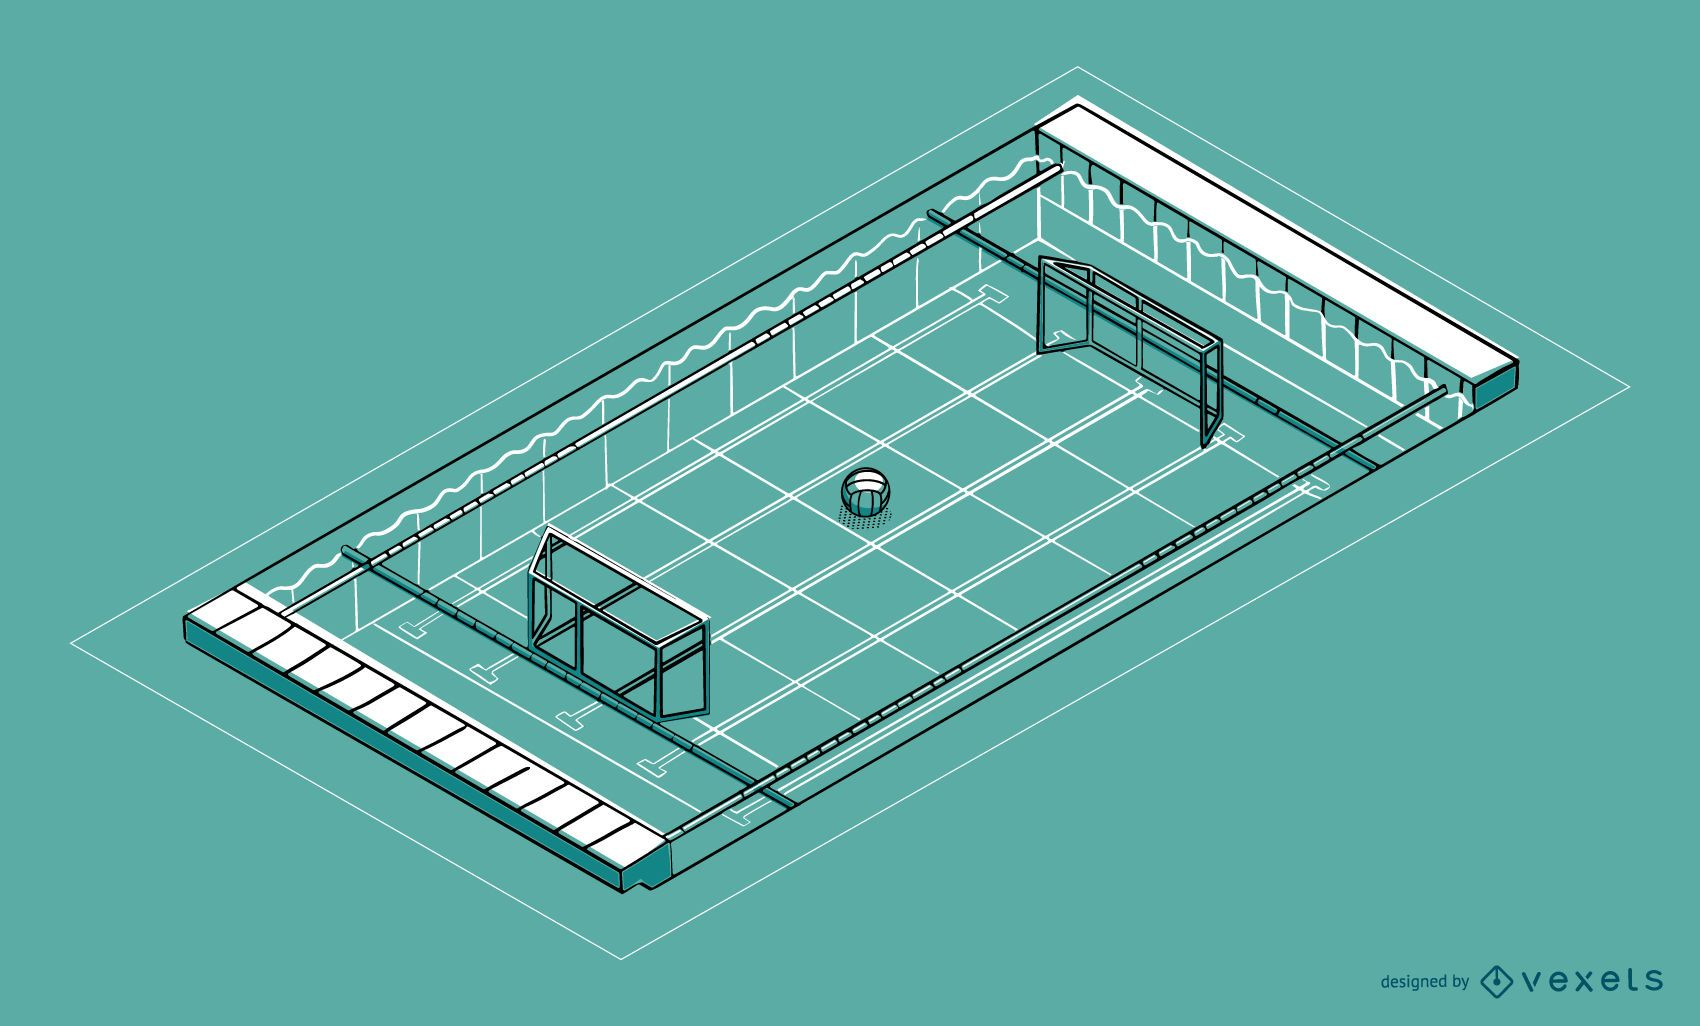 Isometric Water Polo Pool Design